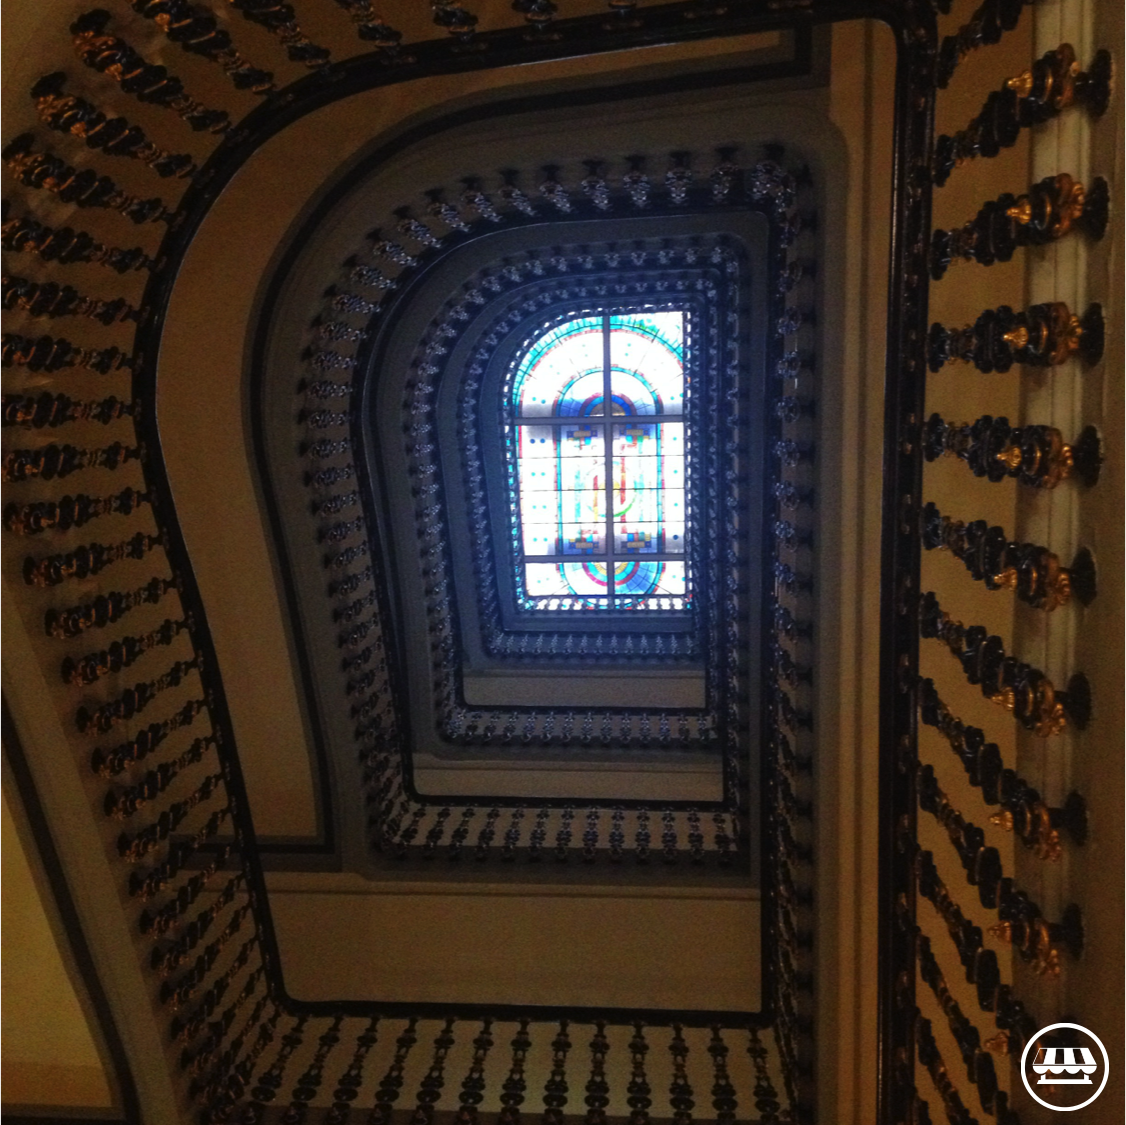 avenida-palace-hotel-lisbon-staircase.png